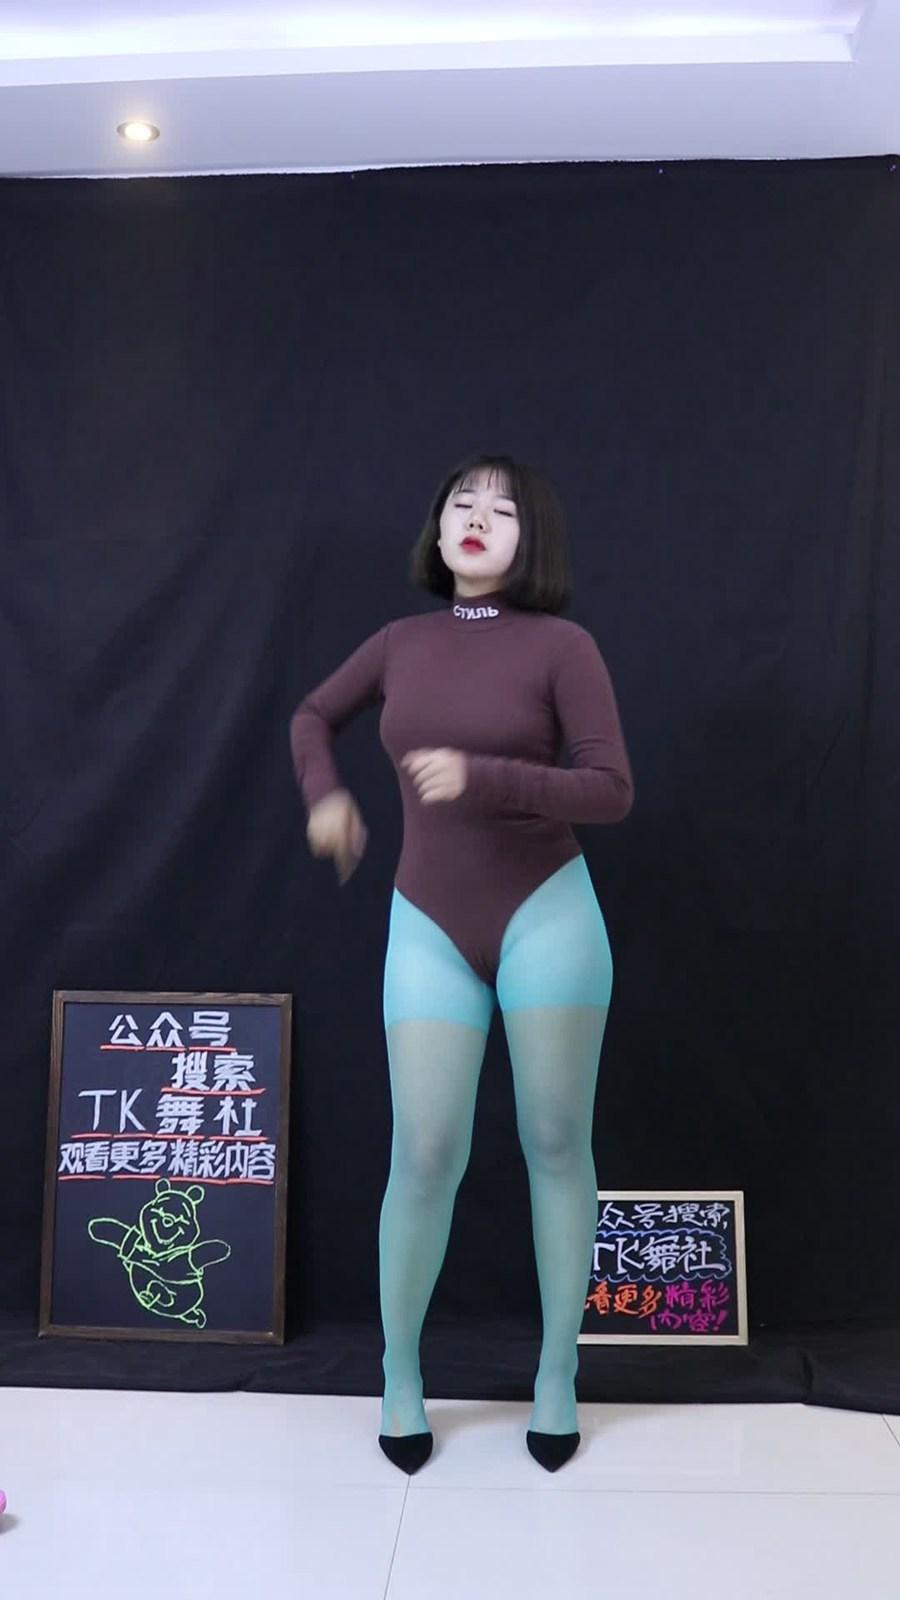 TK舞社 TK舞社 (87)